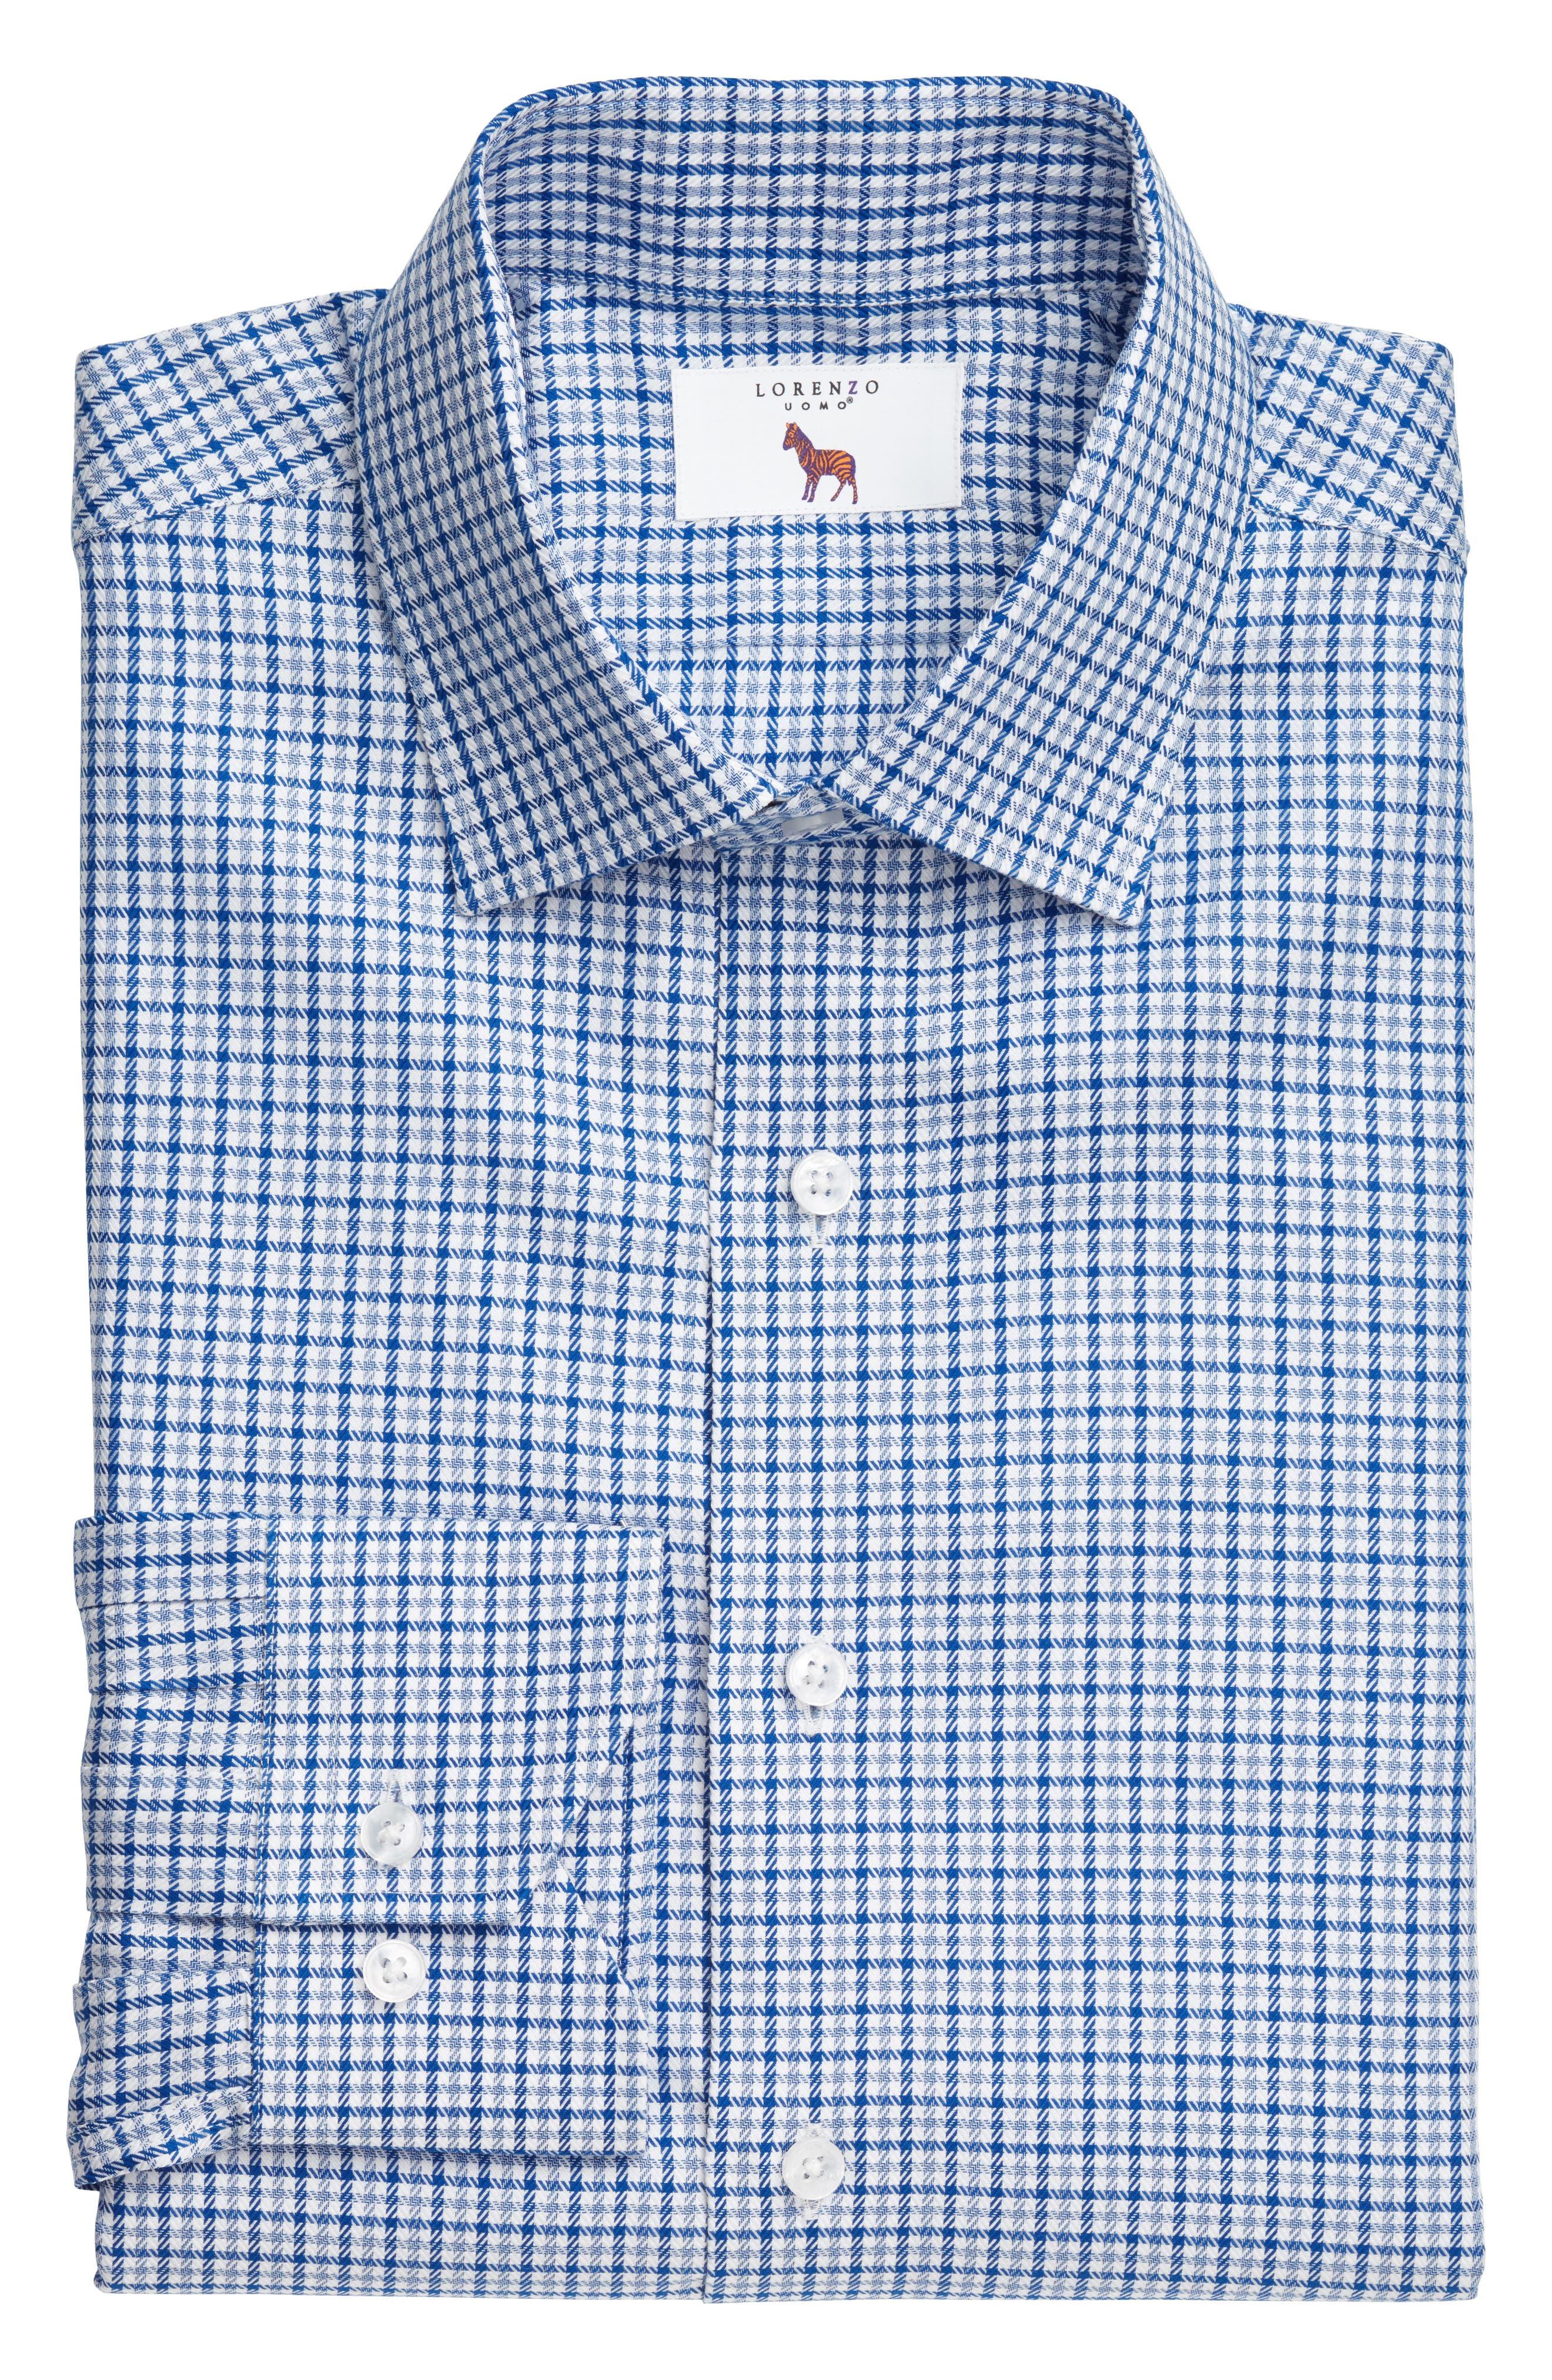 Alternate Image 1 Selected - Lorenzo Uomo Trim Fit Textured Check Dress Shirt